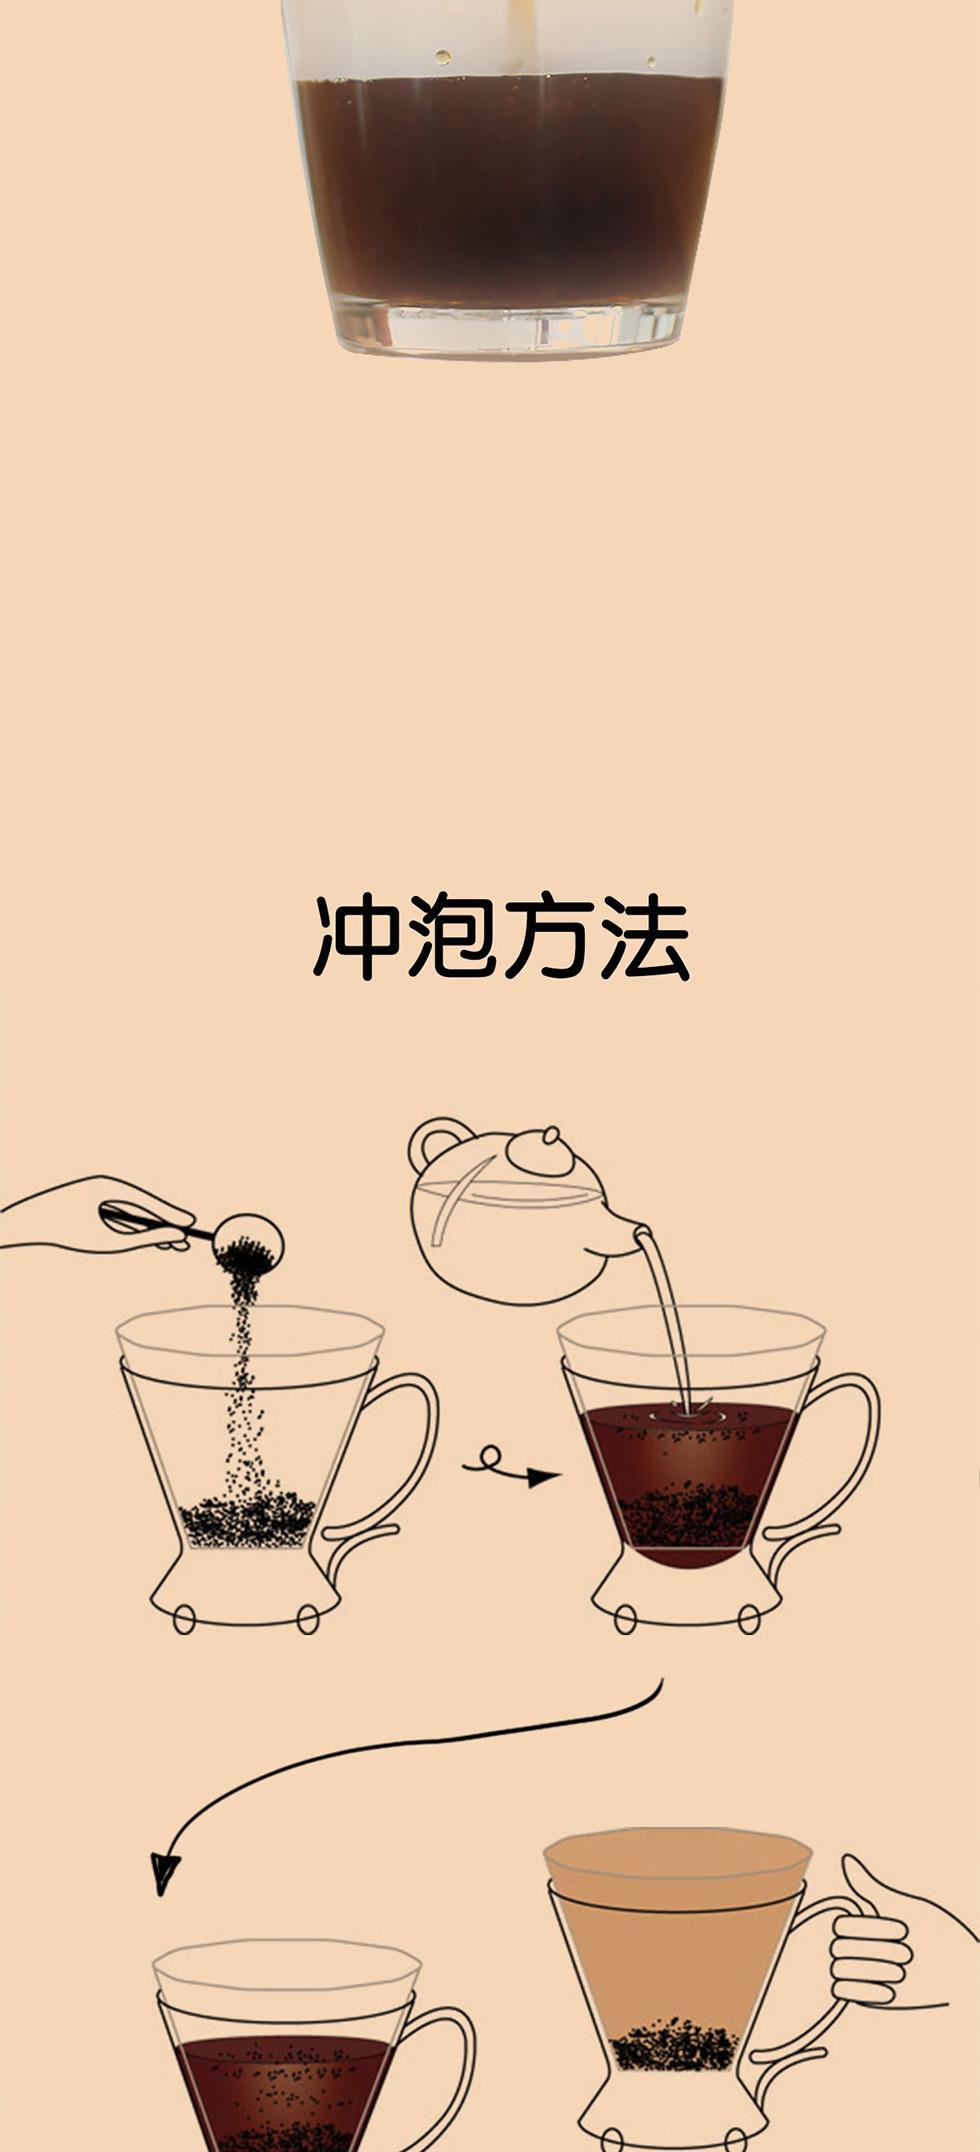 台湾Mr.Clever 聪明杯